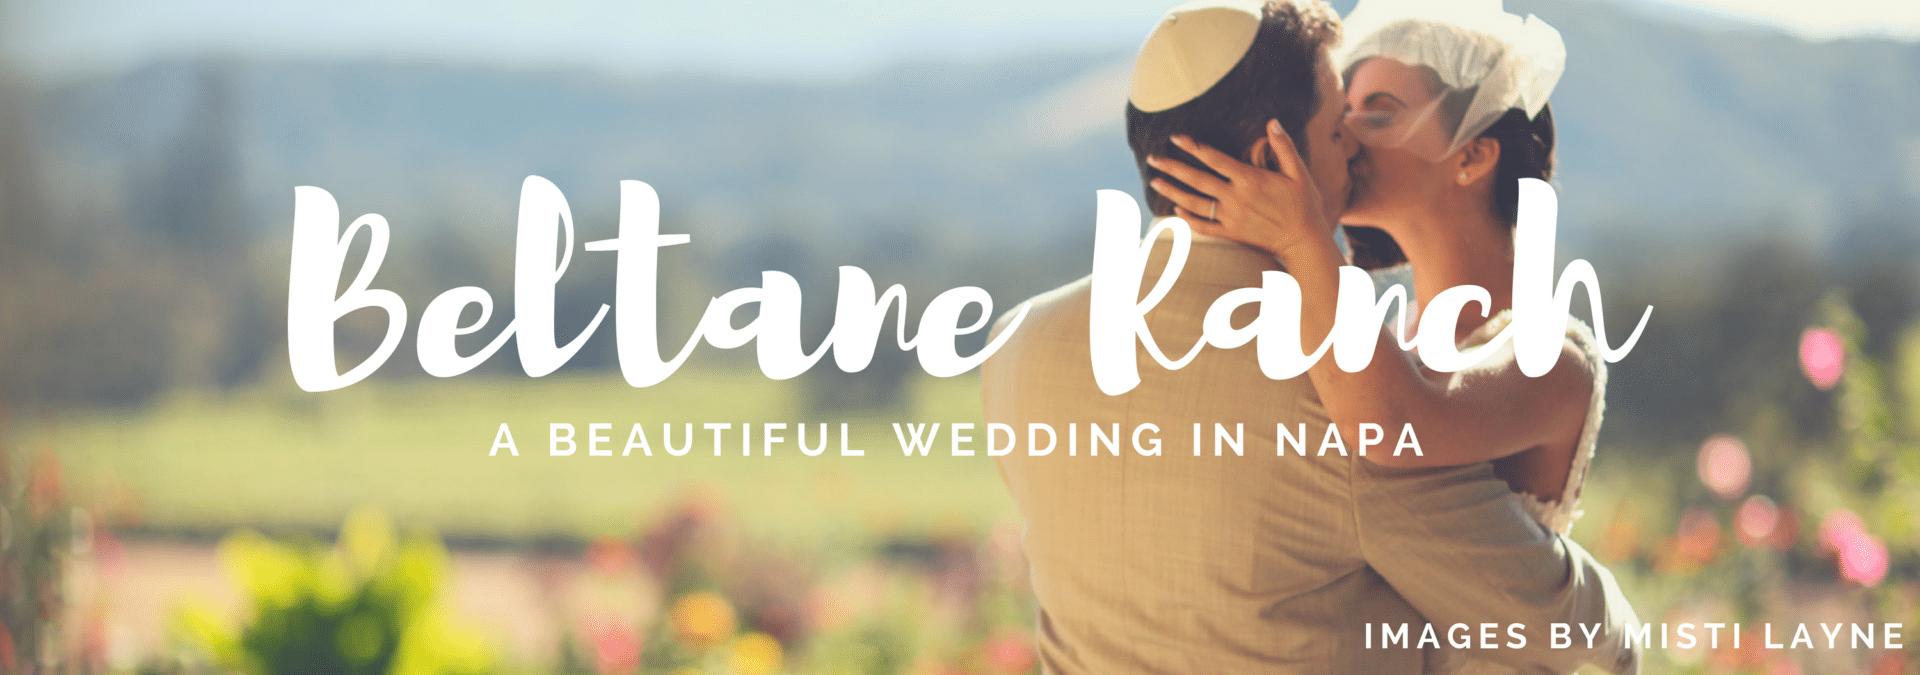 wedding at beltane ranch in napa